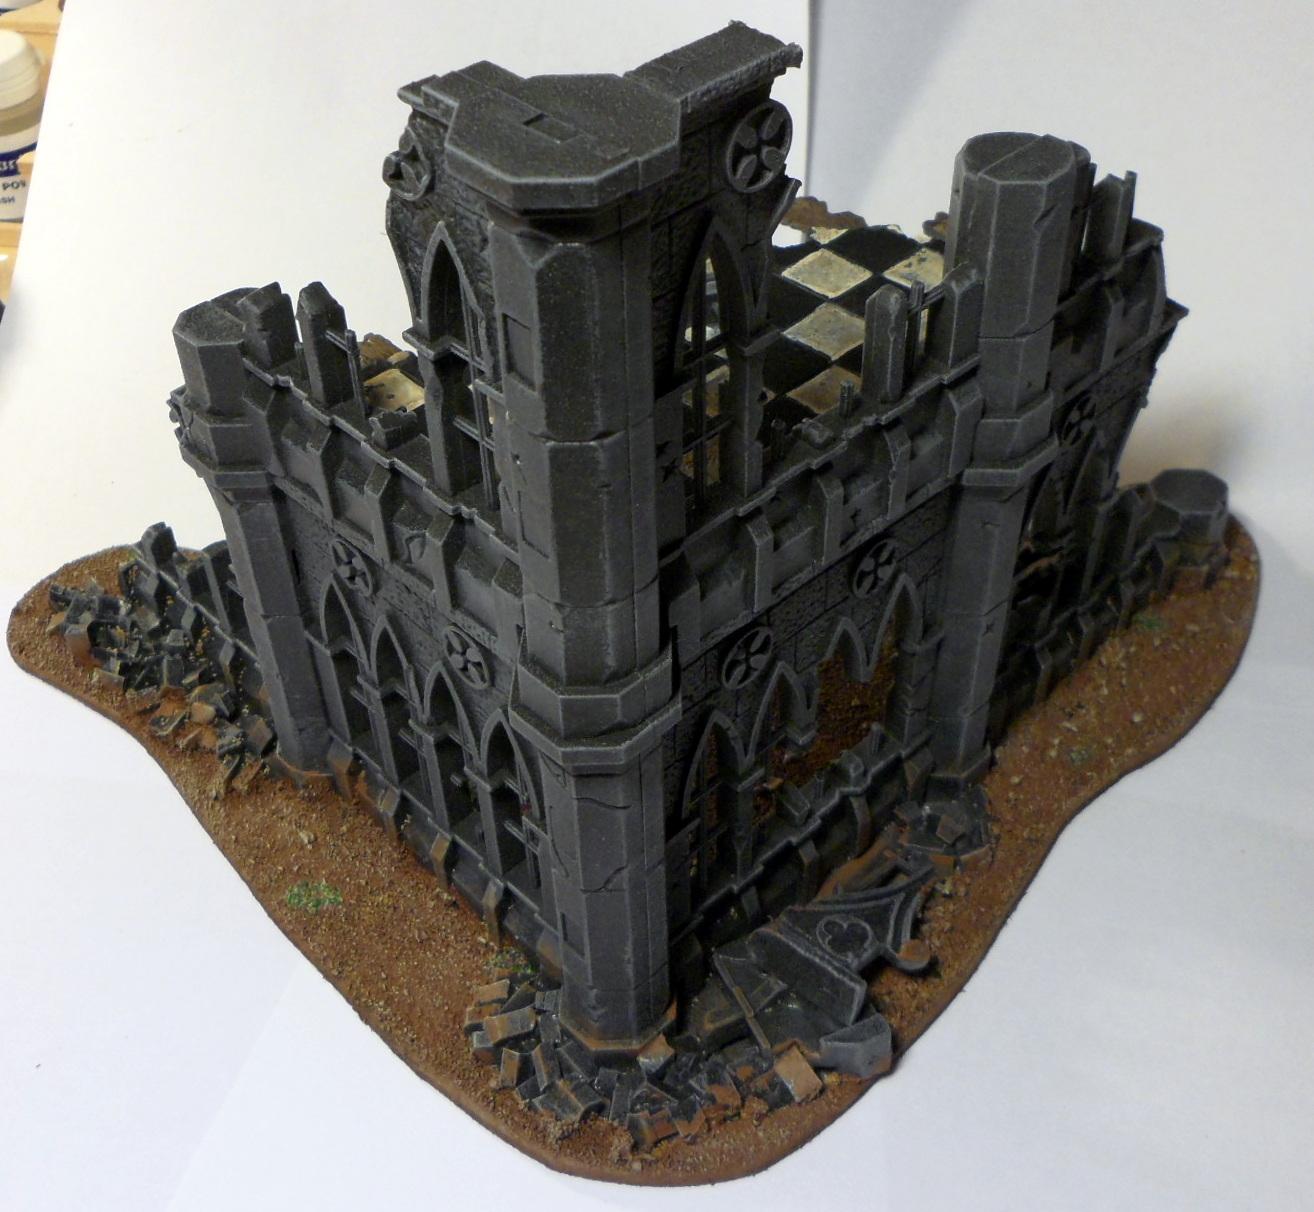 [Image: Stone+Ruins+Scenery+1.JPG]